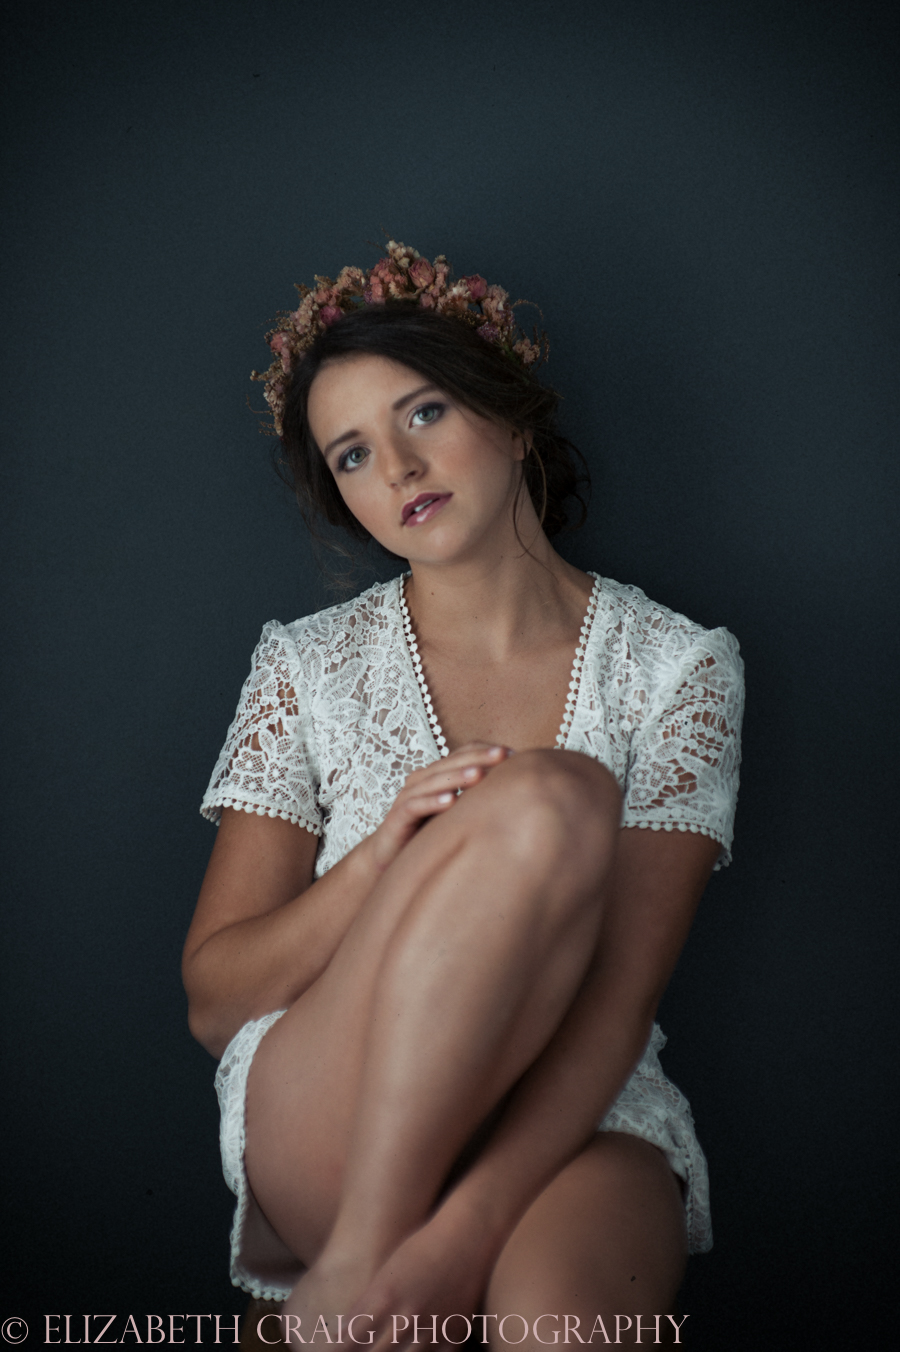 high-school-senior-photographer-pittsburgh-elizabeth-craig-photography-003